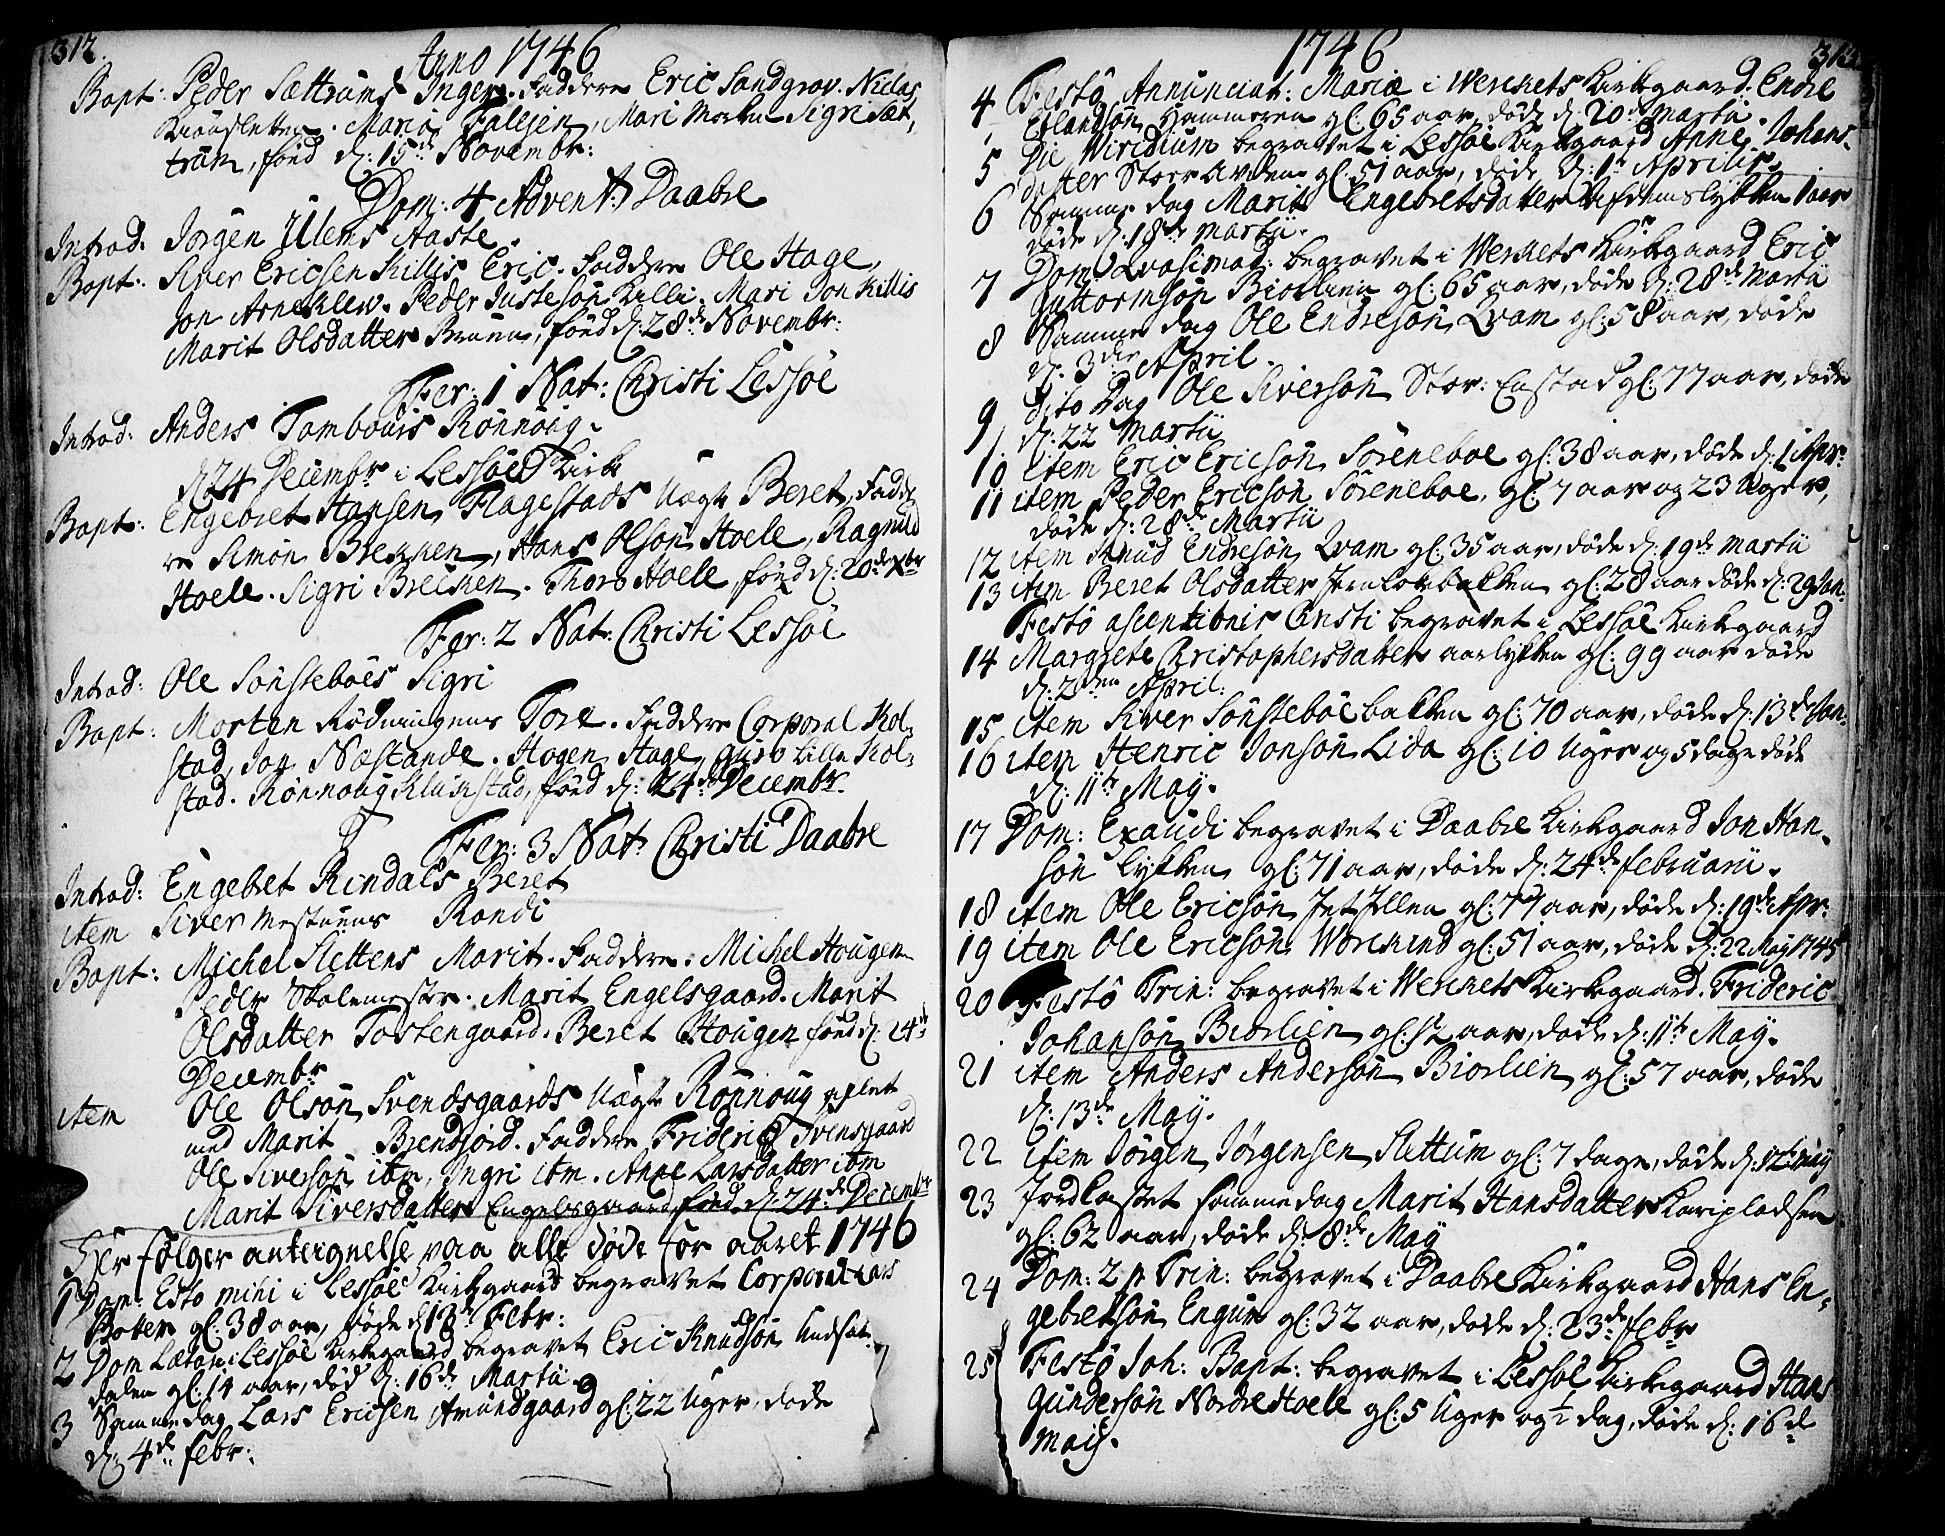 SAH, Lesja prestekontor, Ministerialbok nr. 2, 1732-1776, s. 312-313